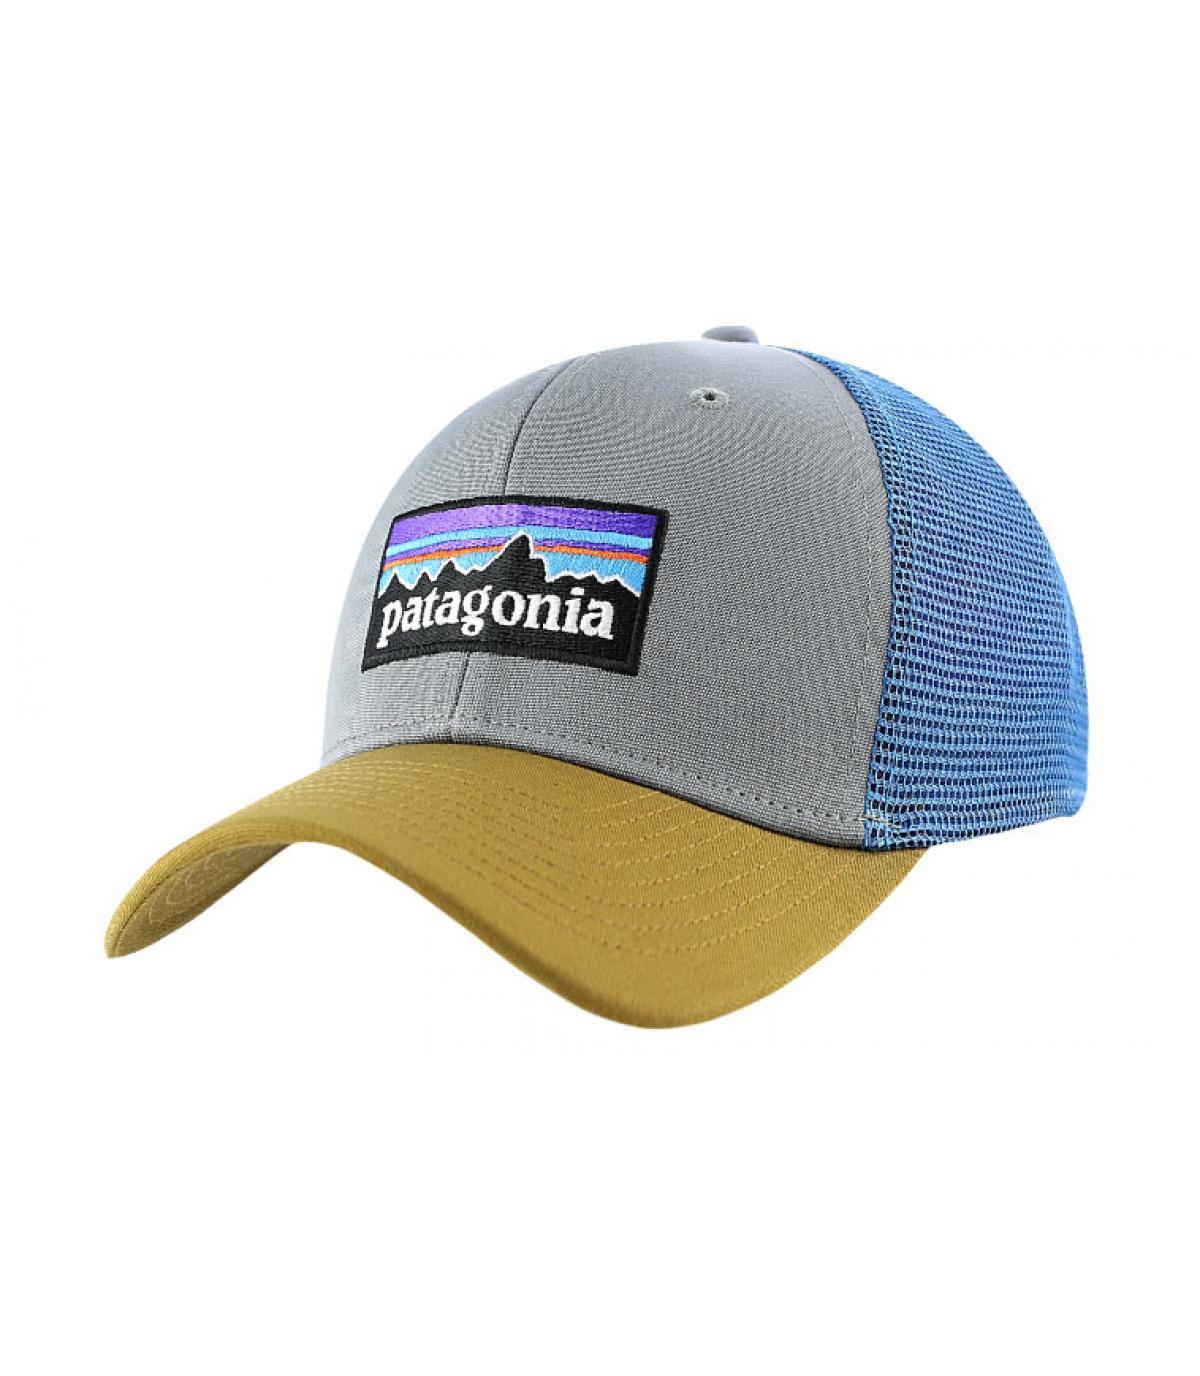 Gorra beisbol gris - P6 logo trucker hat feather grey Patagonia imagen 1 ... 2855e044e52